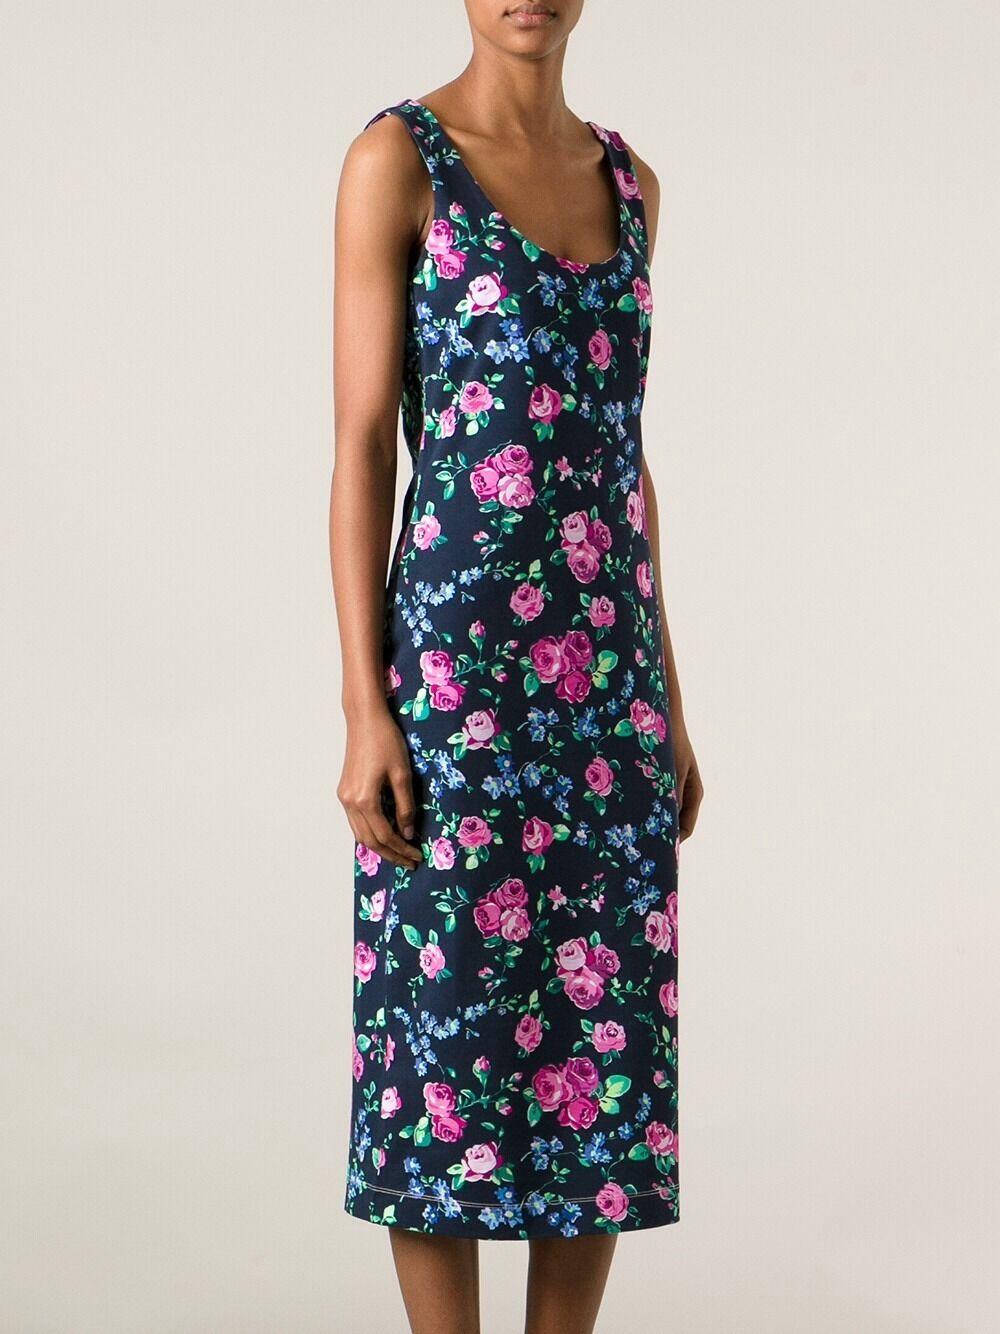 Amazing    CARVEN Kleid dunkelblau BlauMEN bunt Größe S  NEU b307aa